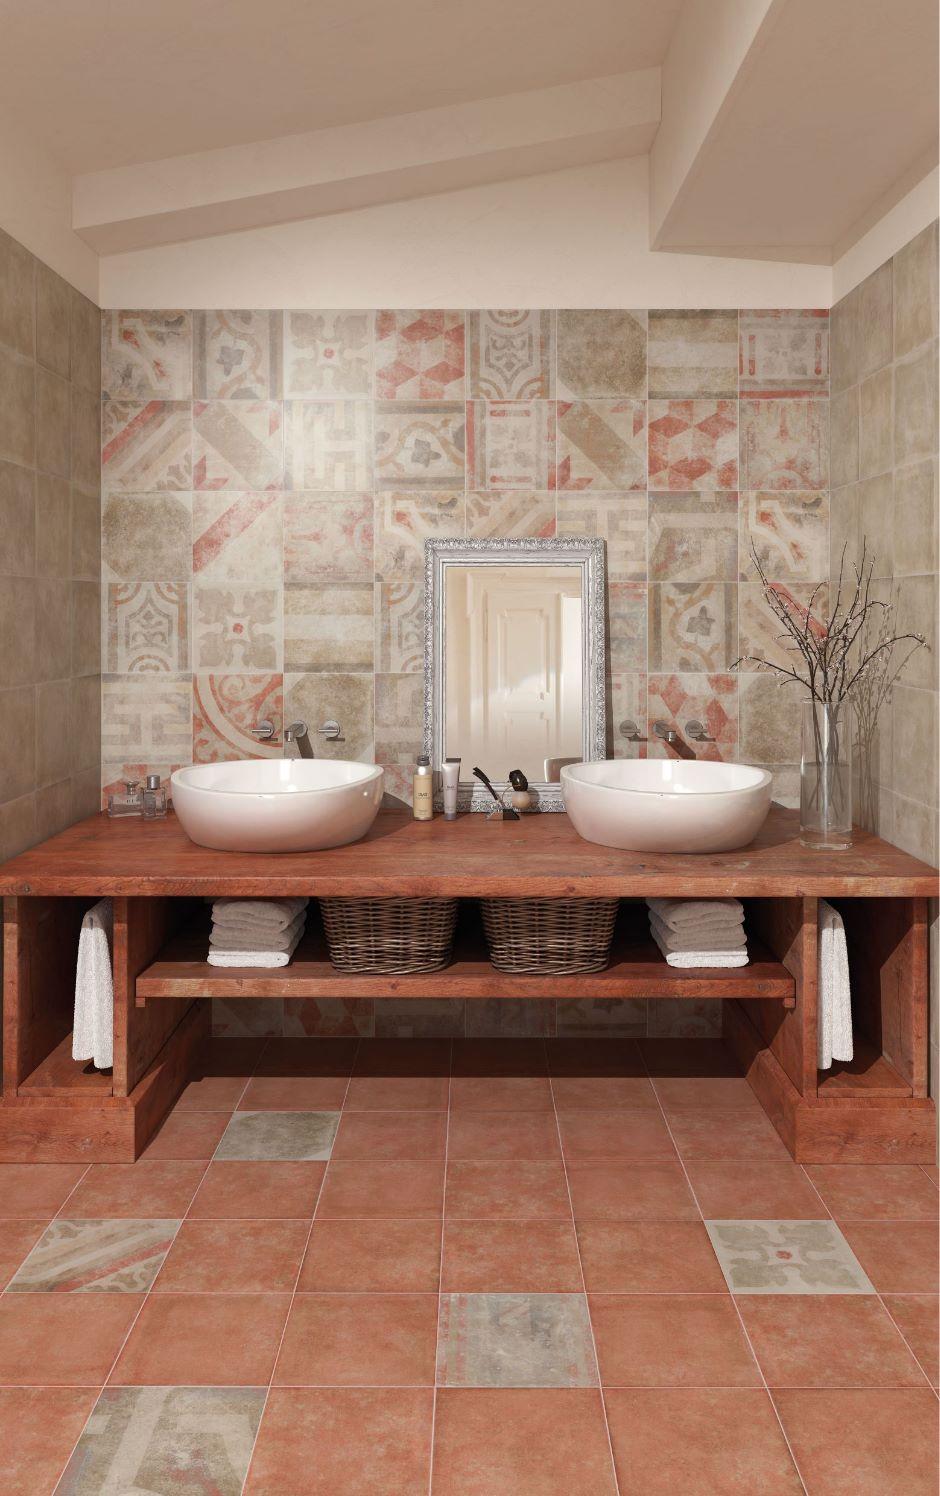 Испанская плитка Codicer коллекция Pompei